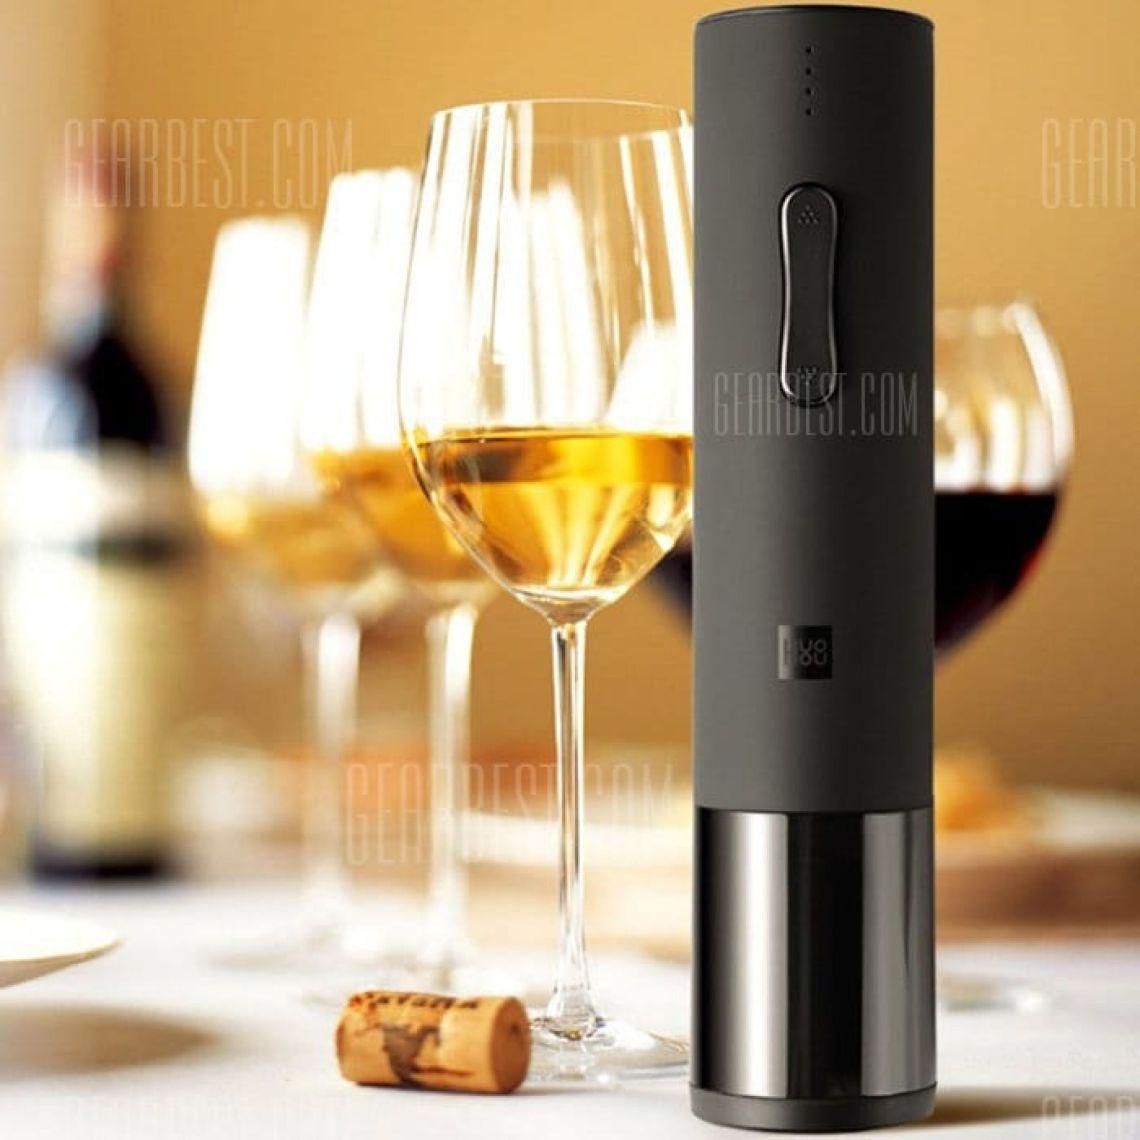 Wine Electric Bottle Opener - $29.99 Free Shipping|GearBest.com